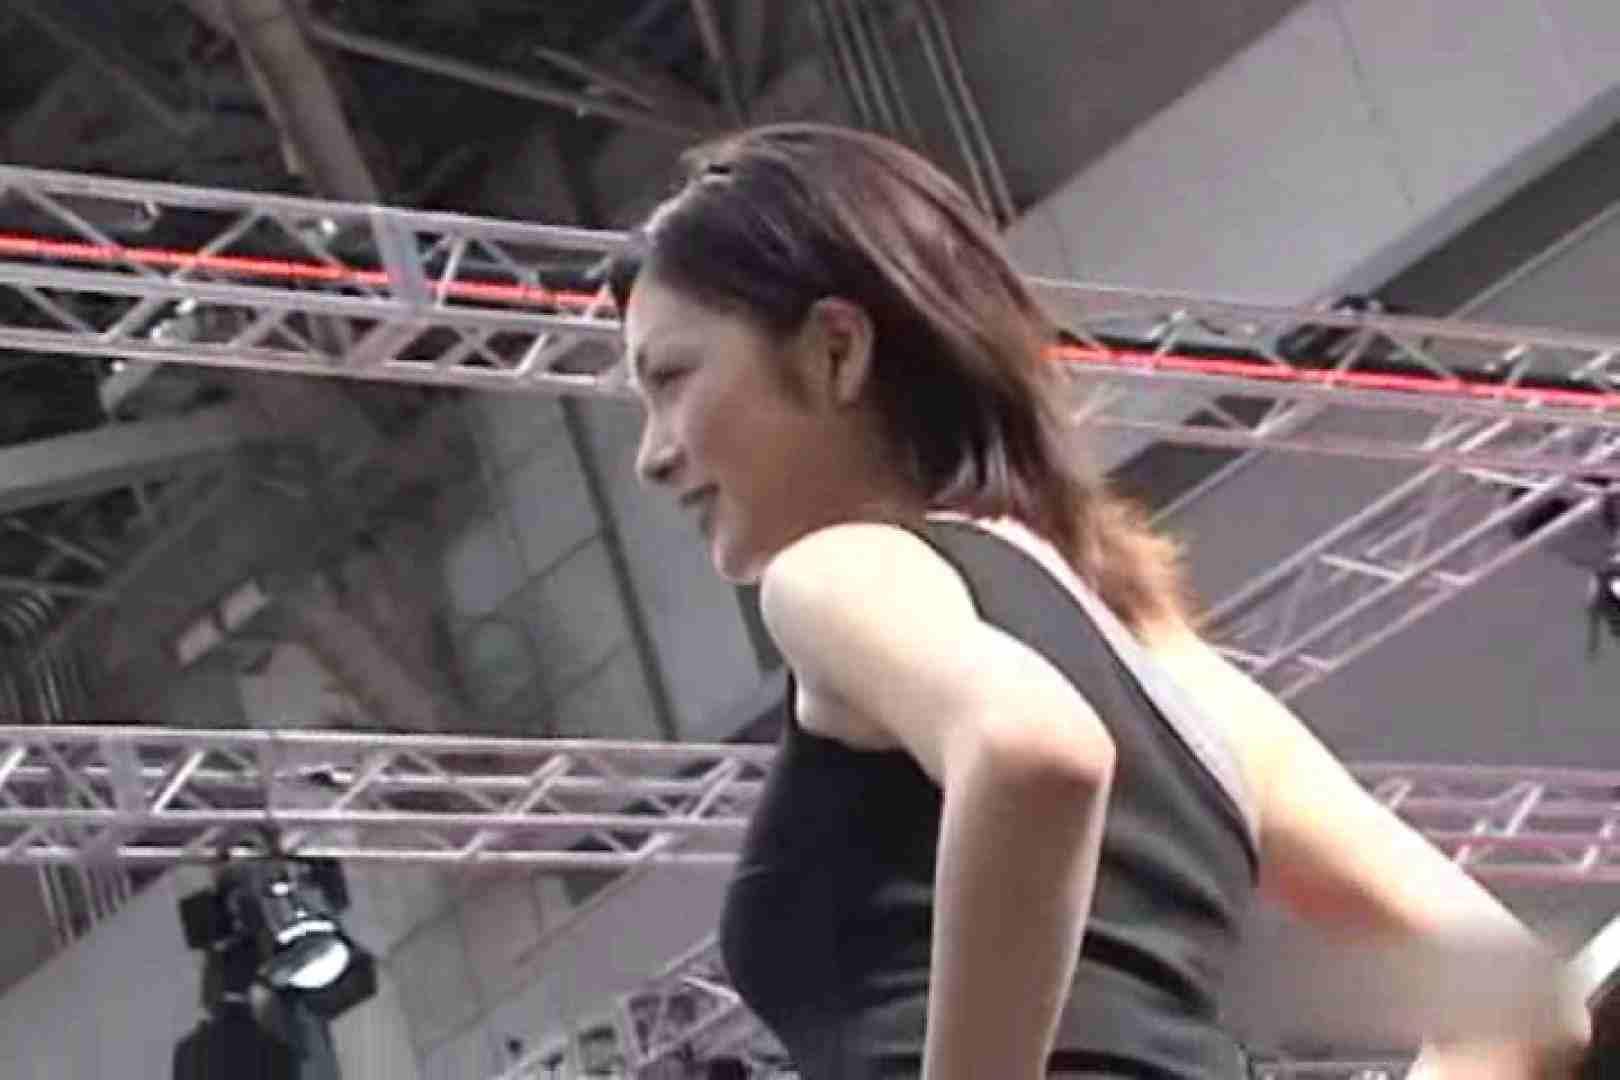 RQカメラ地獄Vol.28 アイドル | OLセックス  78画像 49